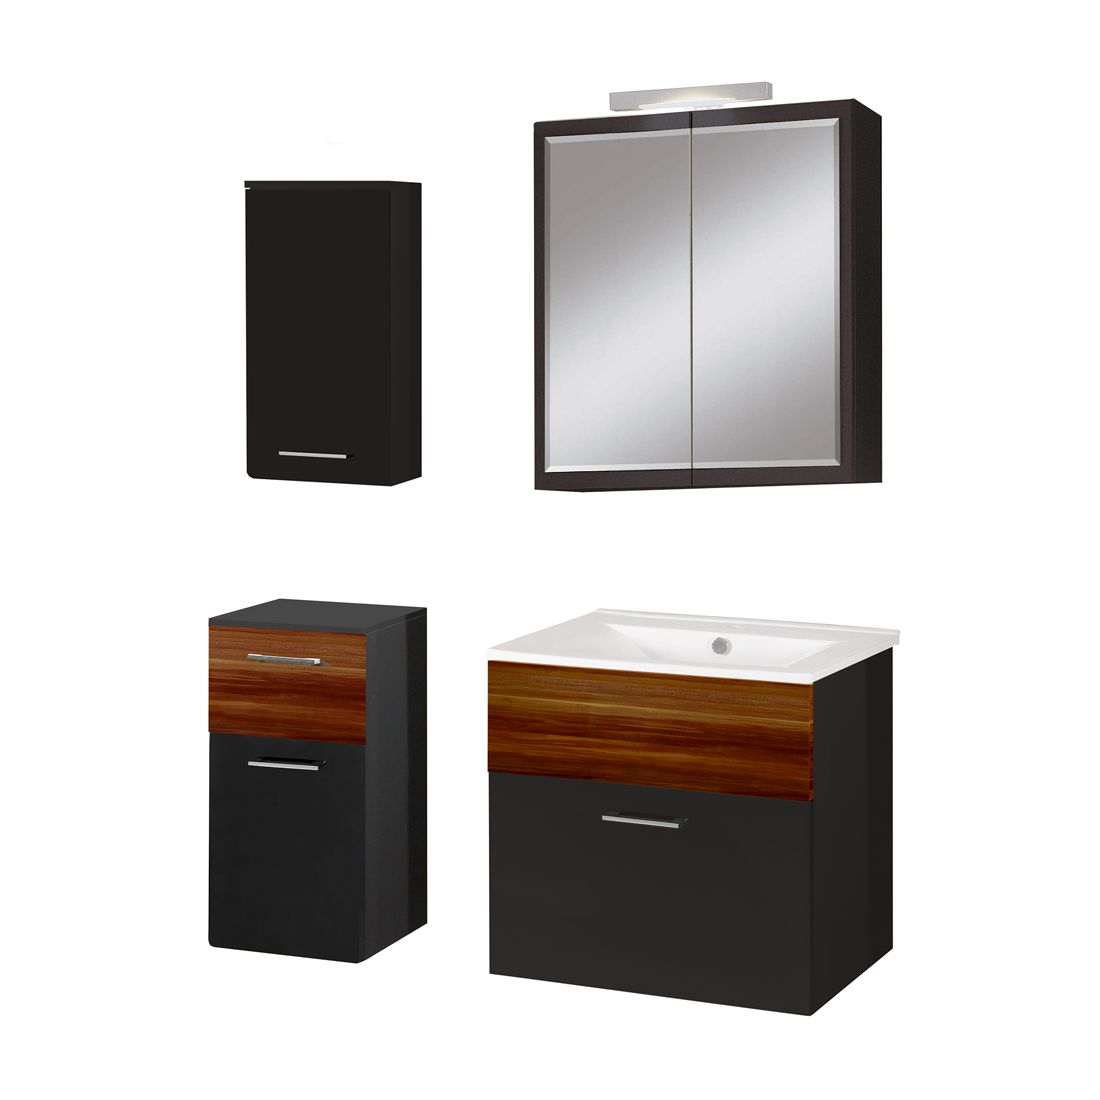 sparsets archive seite 5 von 23. Black Bedroom Furniture Sets. Home Design Ideas